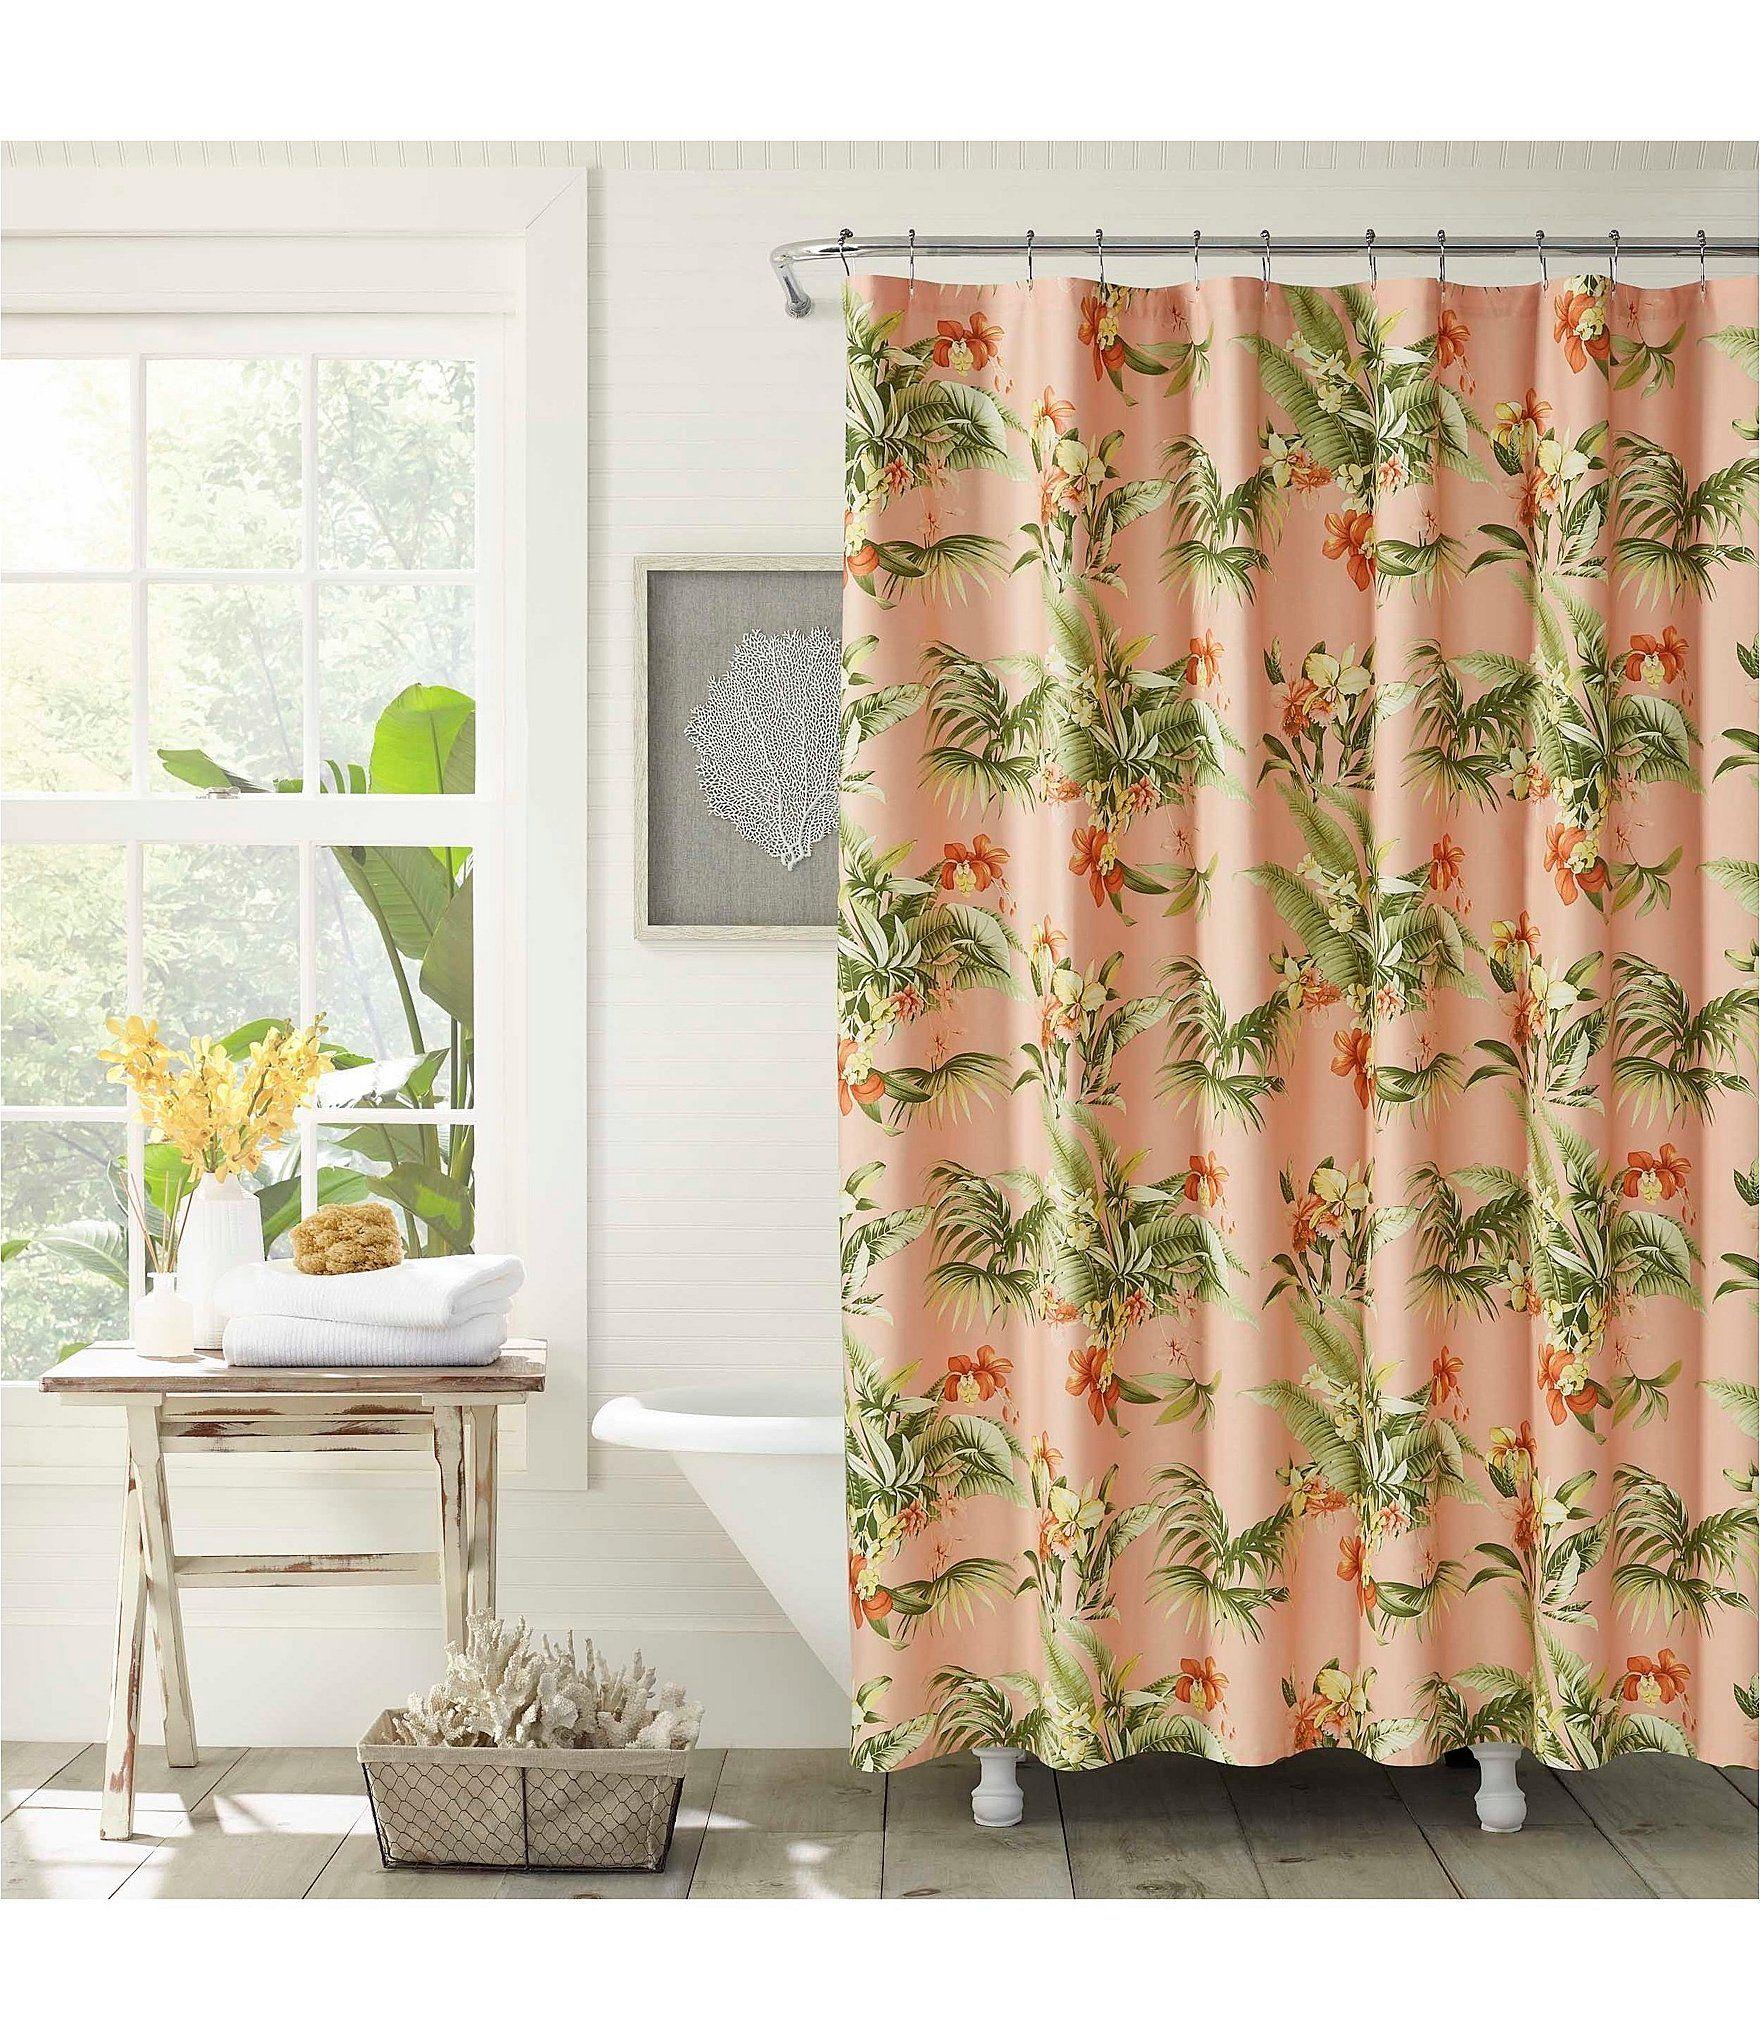 Tommy Bahama Siesta Key Shower Curtain Cantaloupe 72 In X 72 In In 2020 Tommy Bahama Floral Shower Curtains Curtains